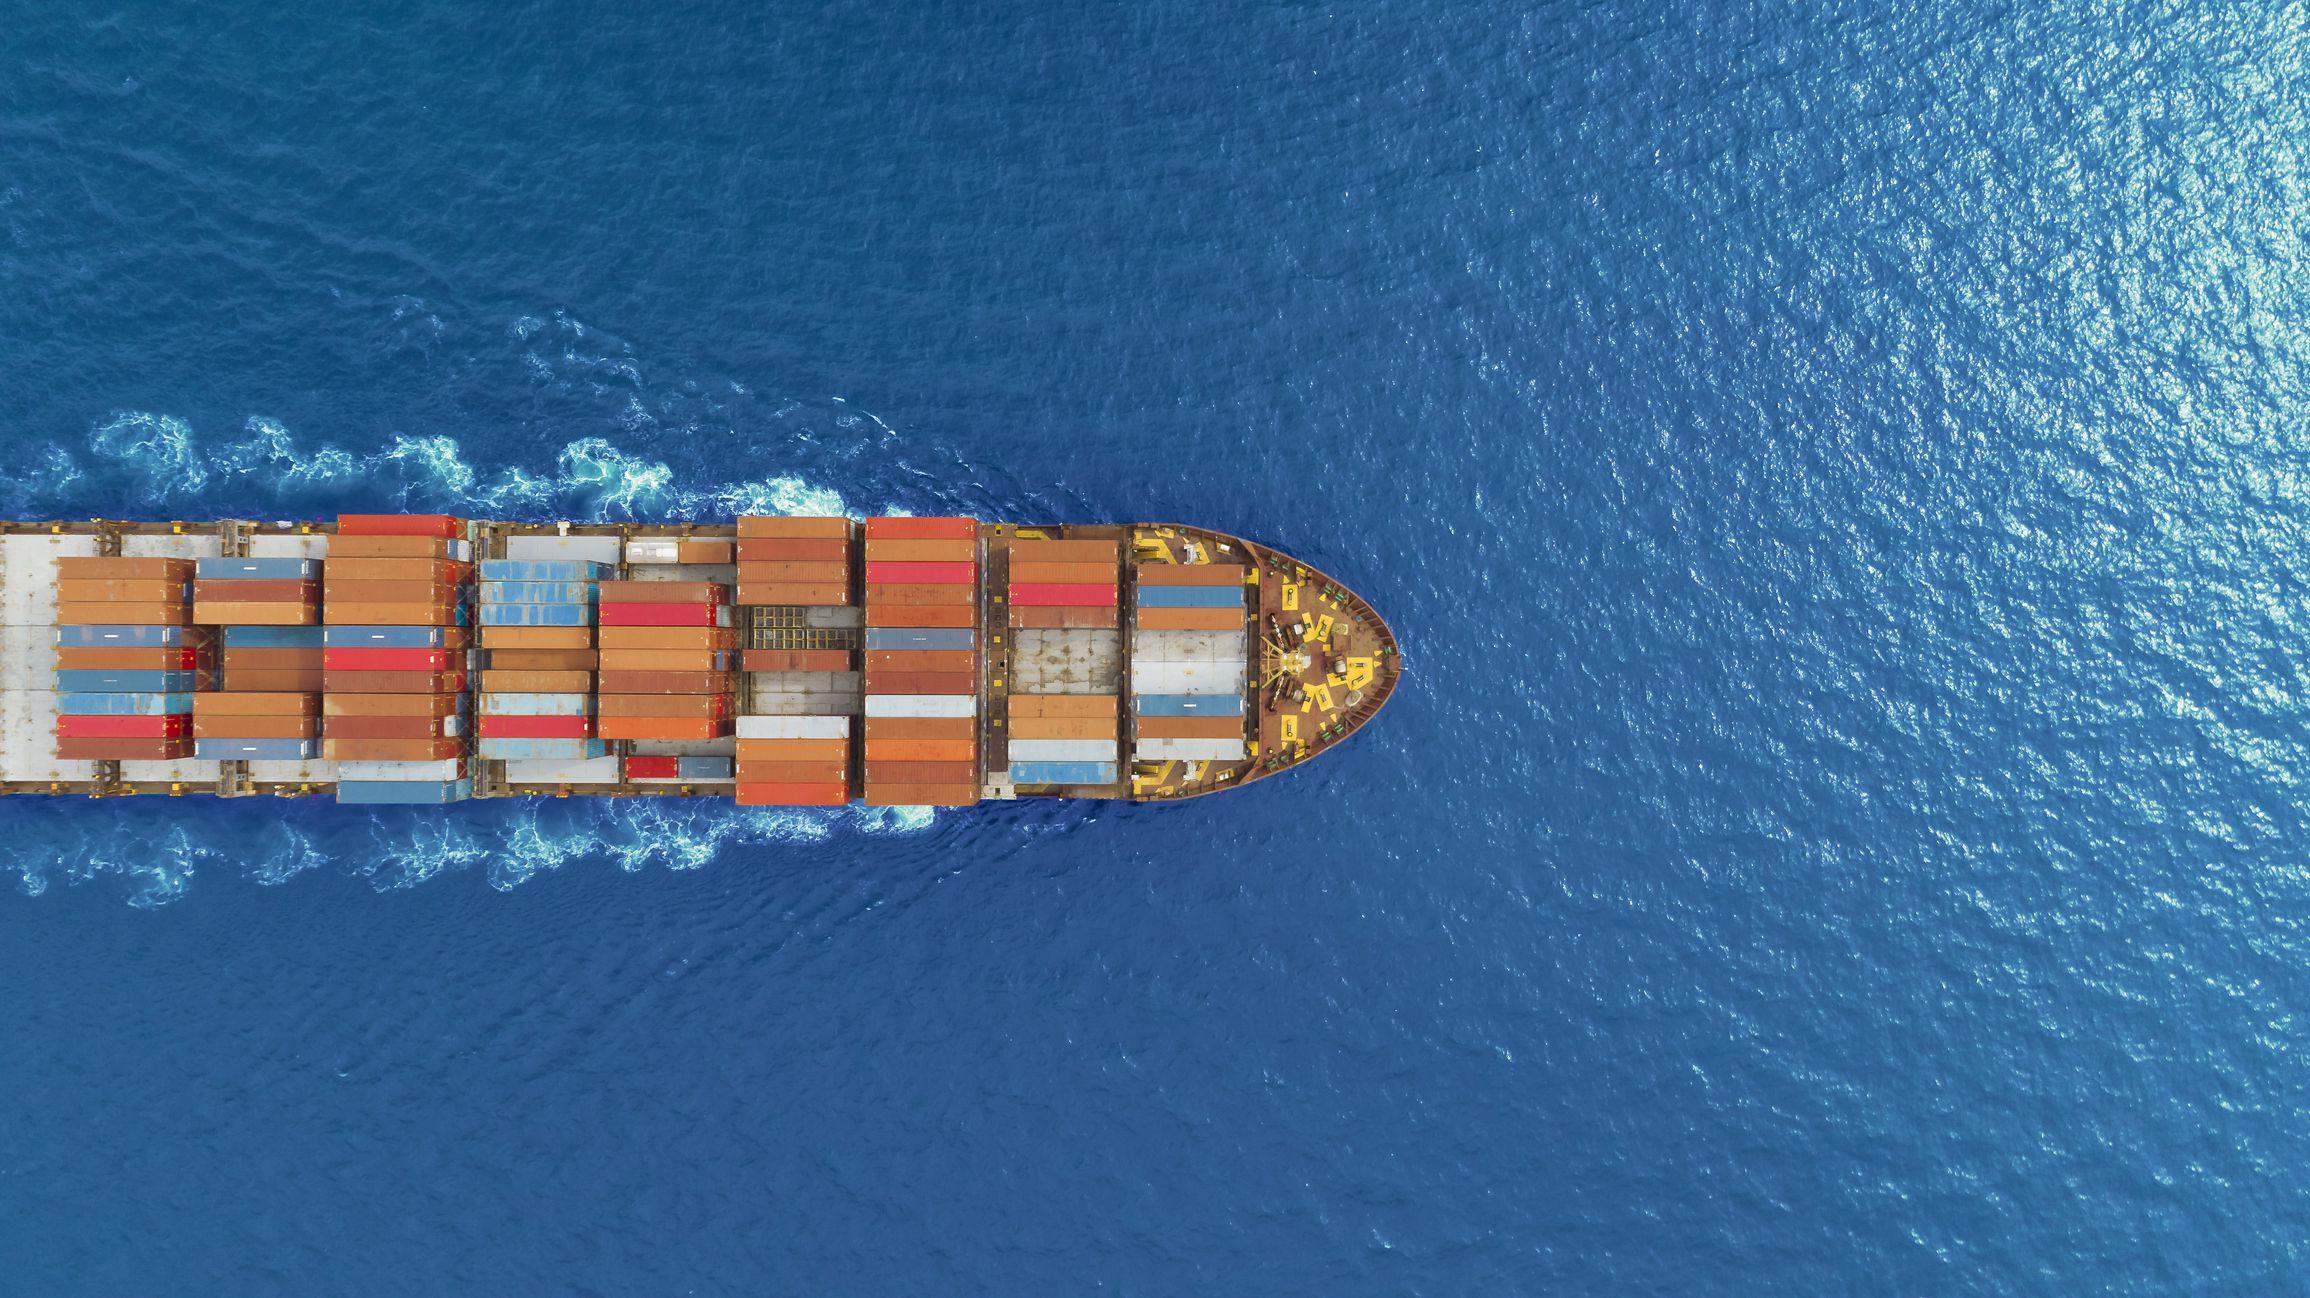 General Agreement On Tariffs And Trade (GATT)